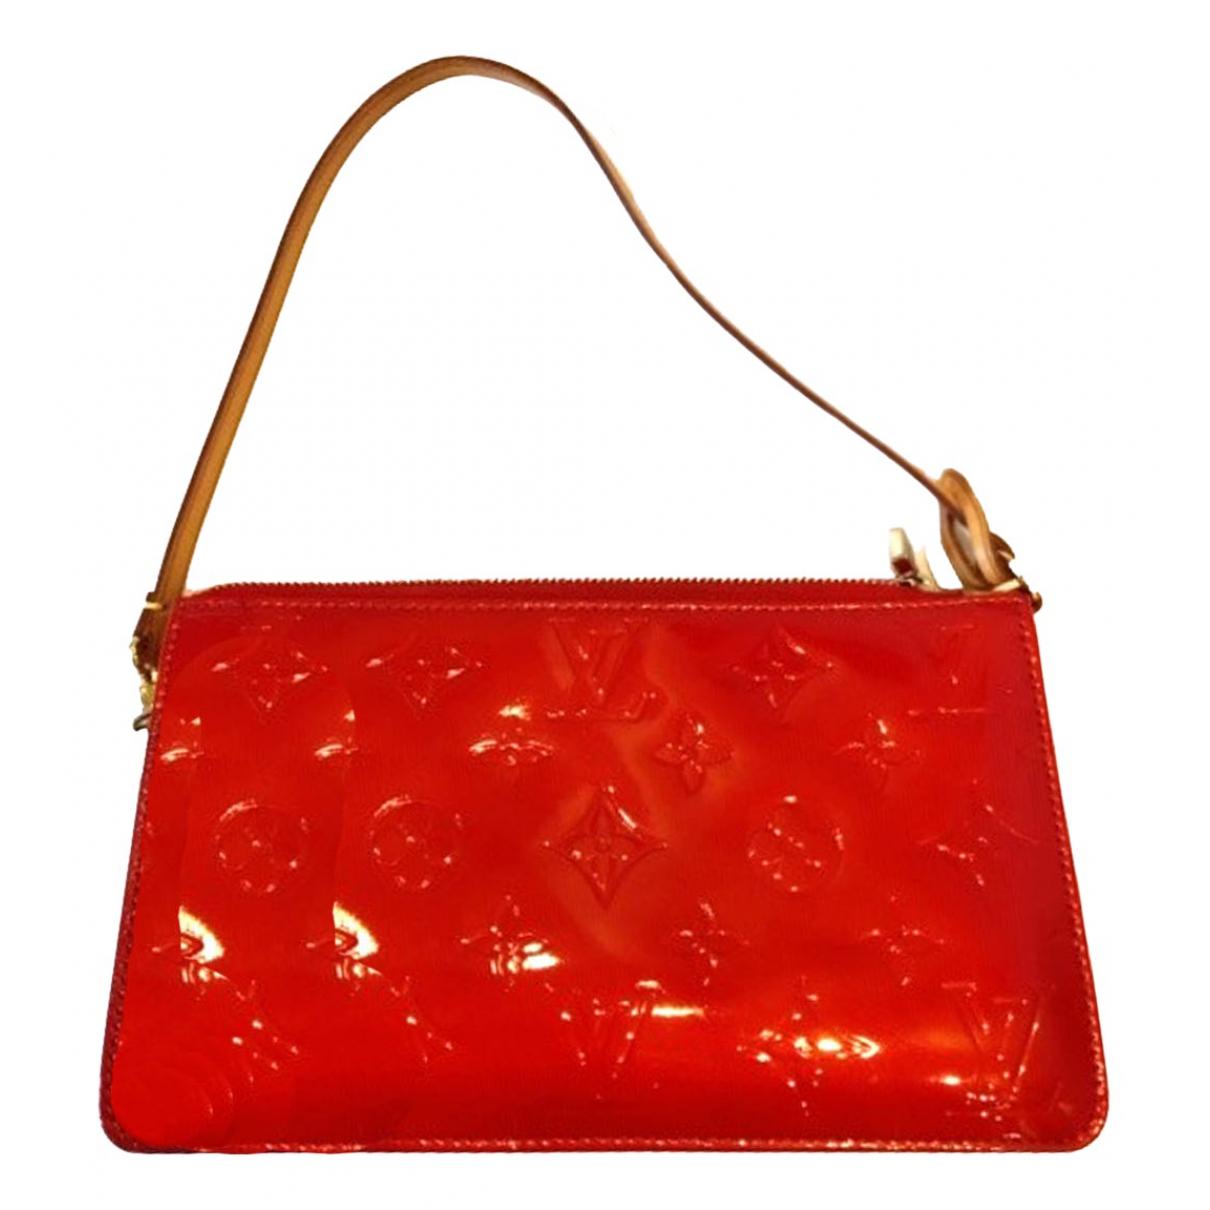 Louis Vuitton Lexington Red Patent leather Clutch bag for Women N